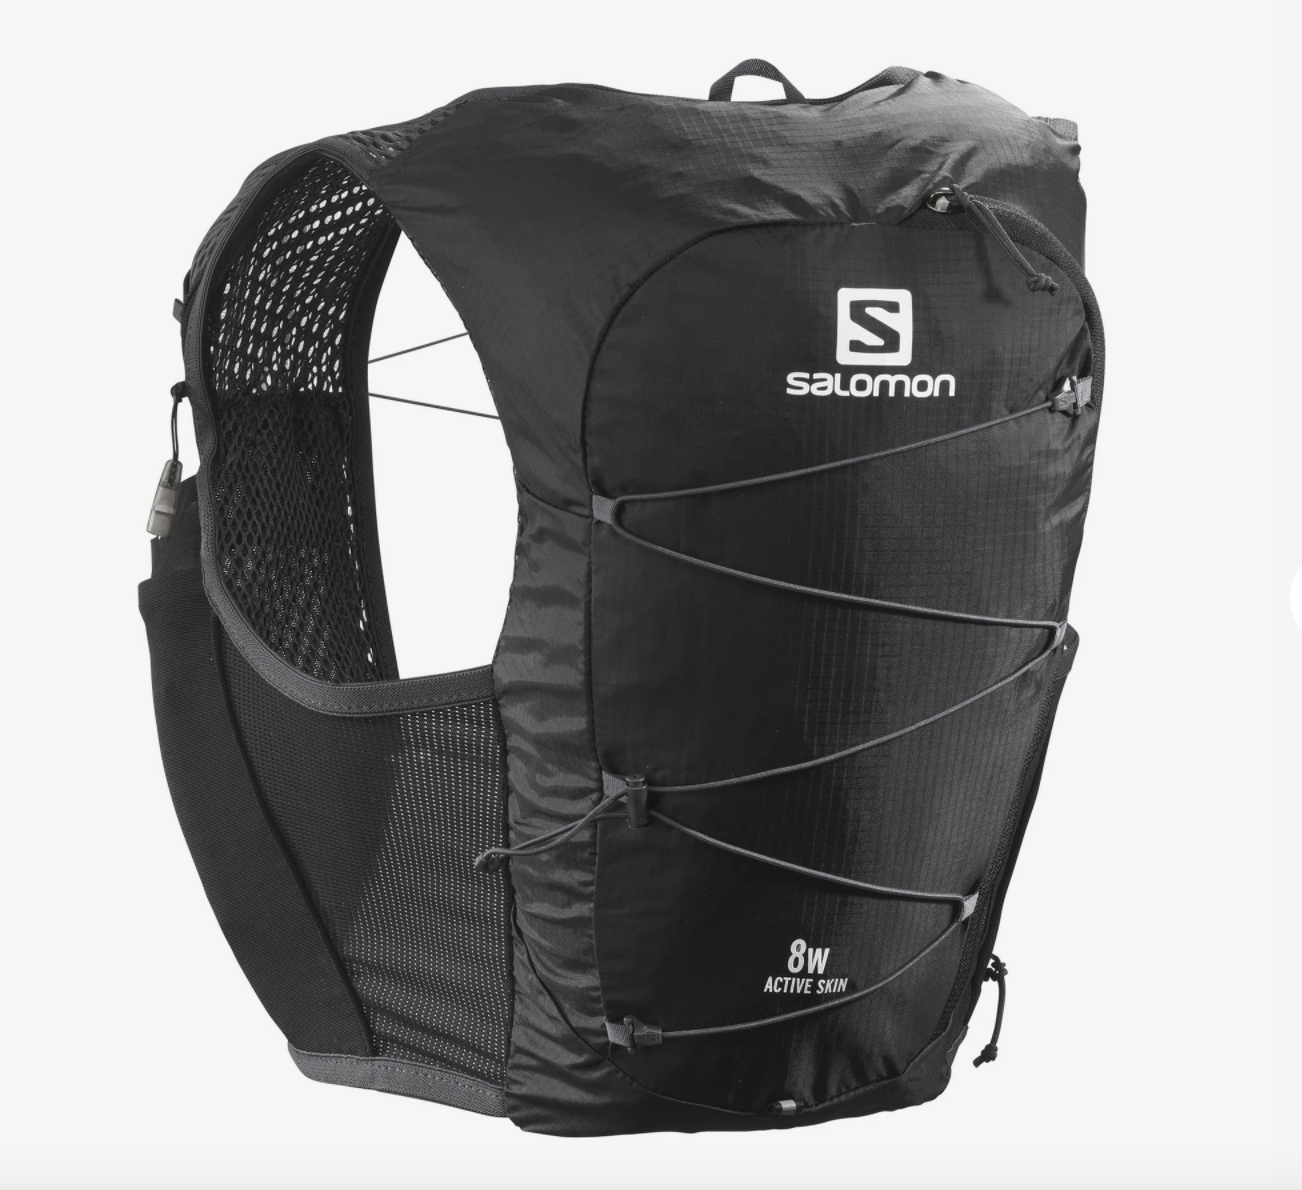 Salomon サロモン ACTIVE SKIN 8 ウィメンズ - 女性用ランニングベスト(フラスク付) ブラック(フラスク付) LC1568400 BLACK